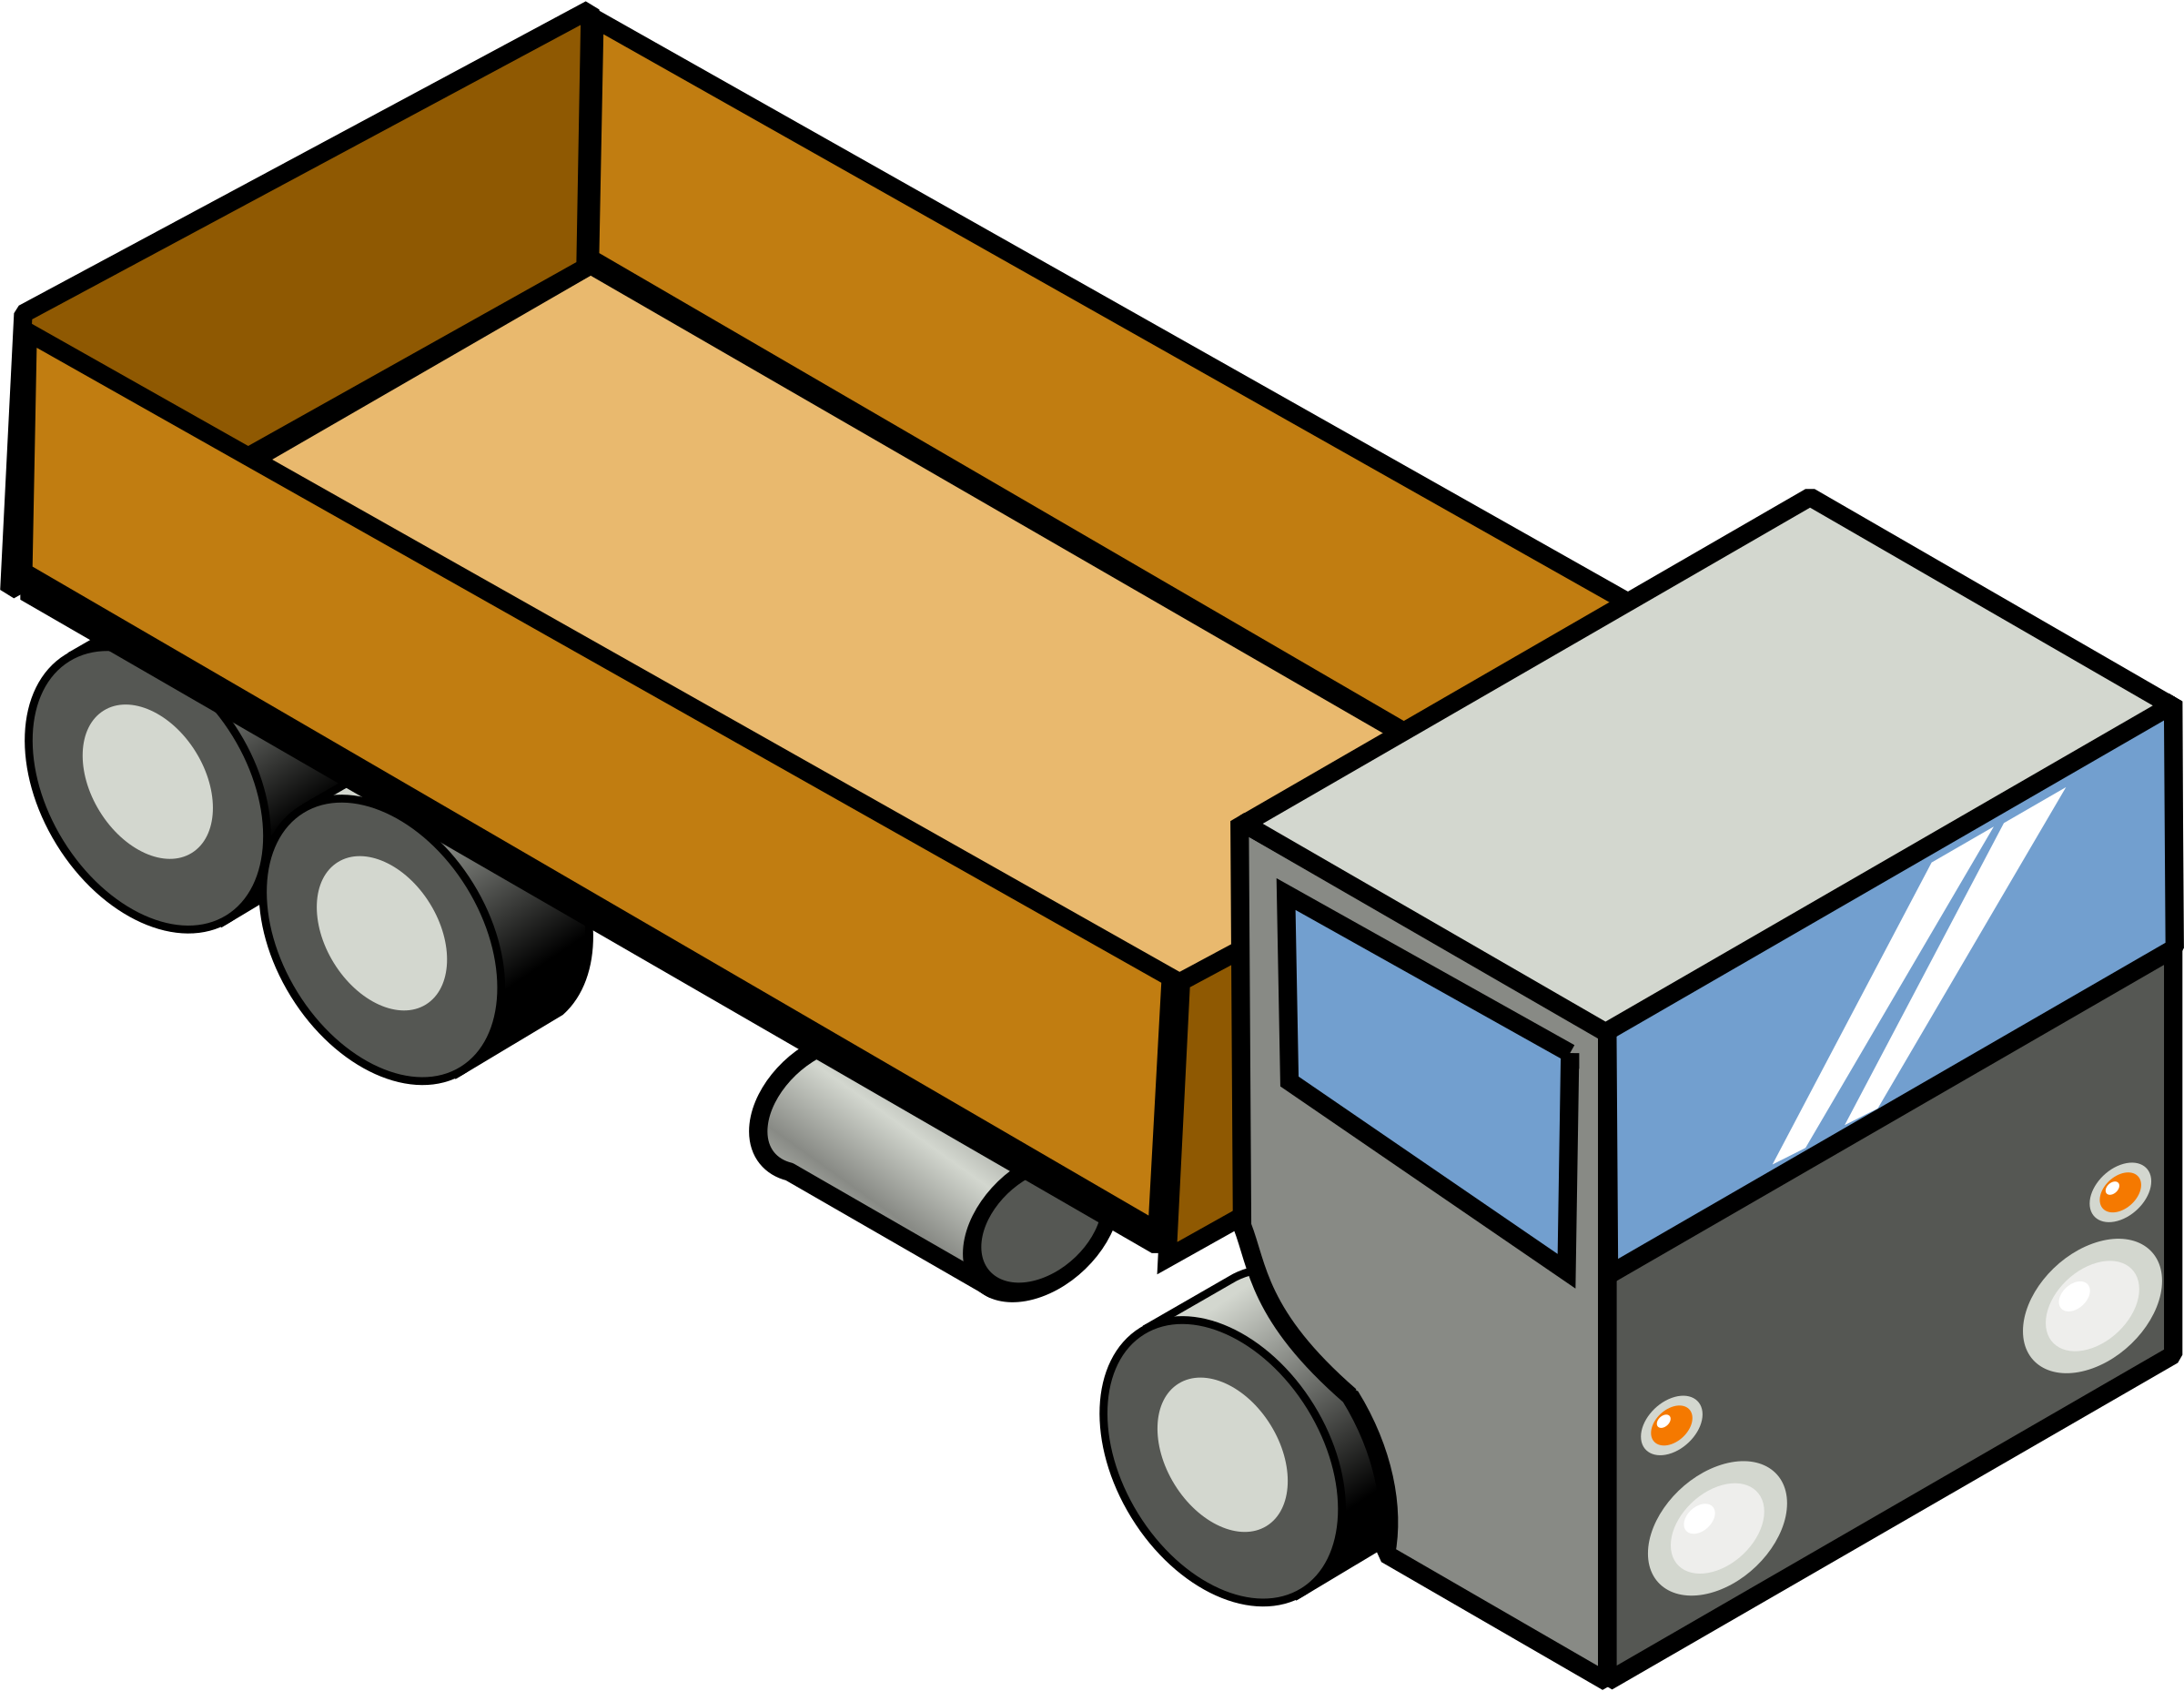 2400x1858 Truck Clip Art Images Black